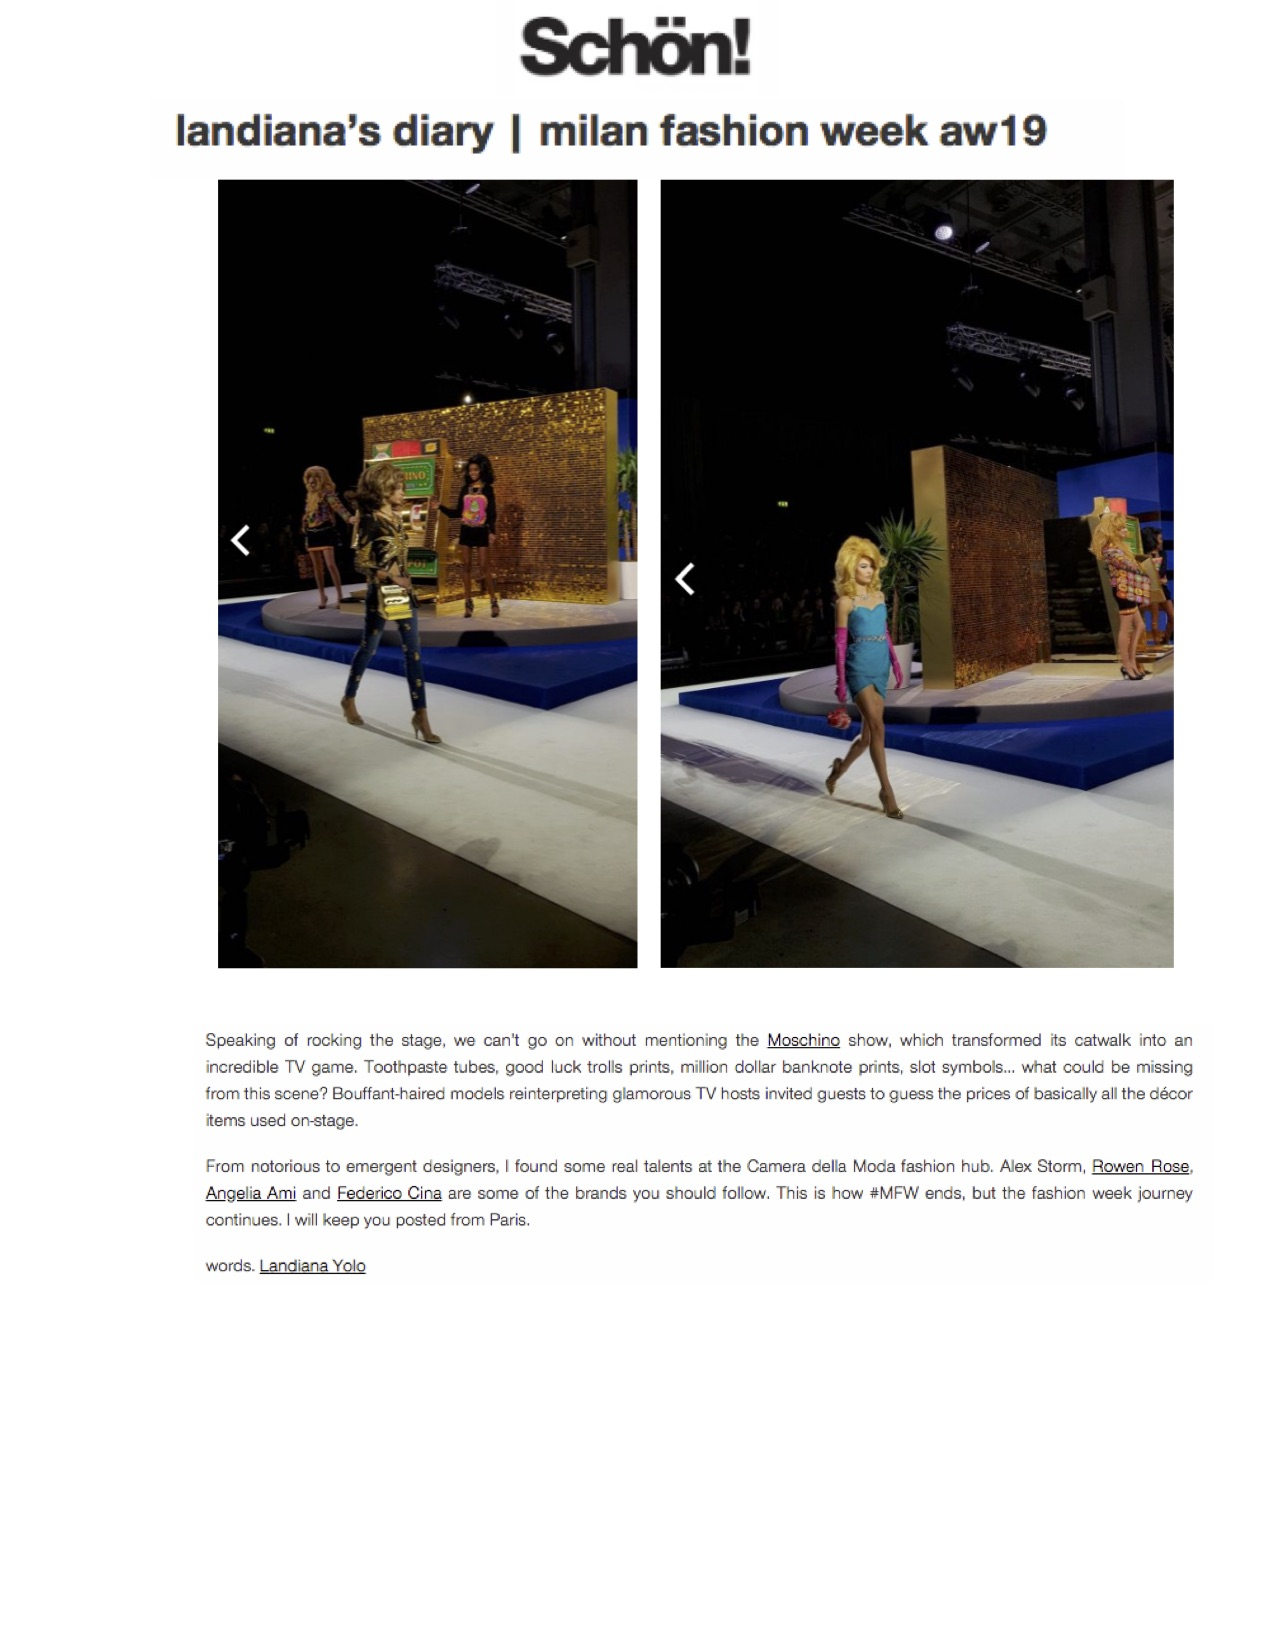 Schon Magazine - Good Luck Trolls x Moschino.jpg